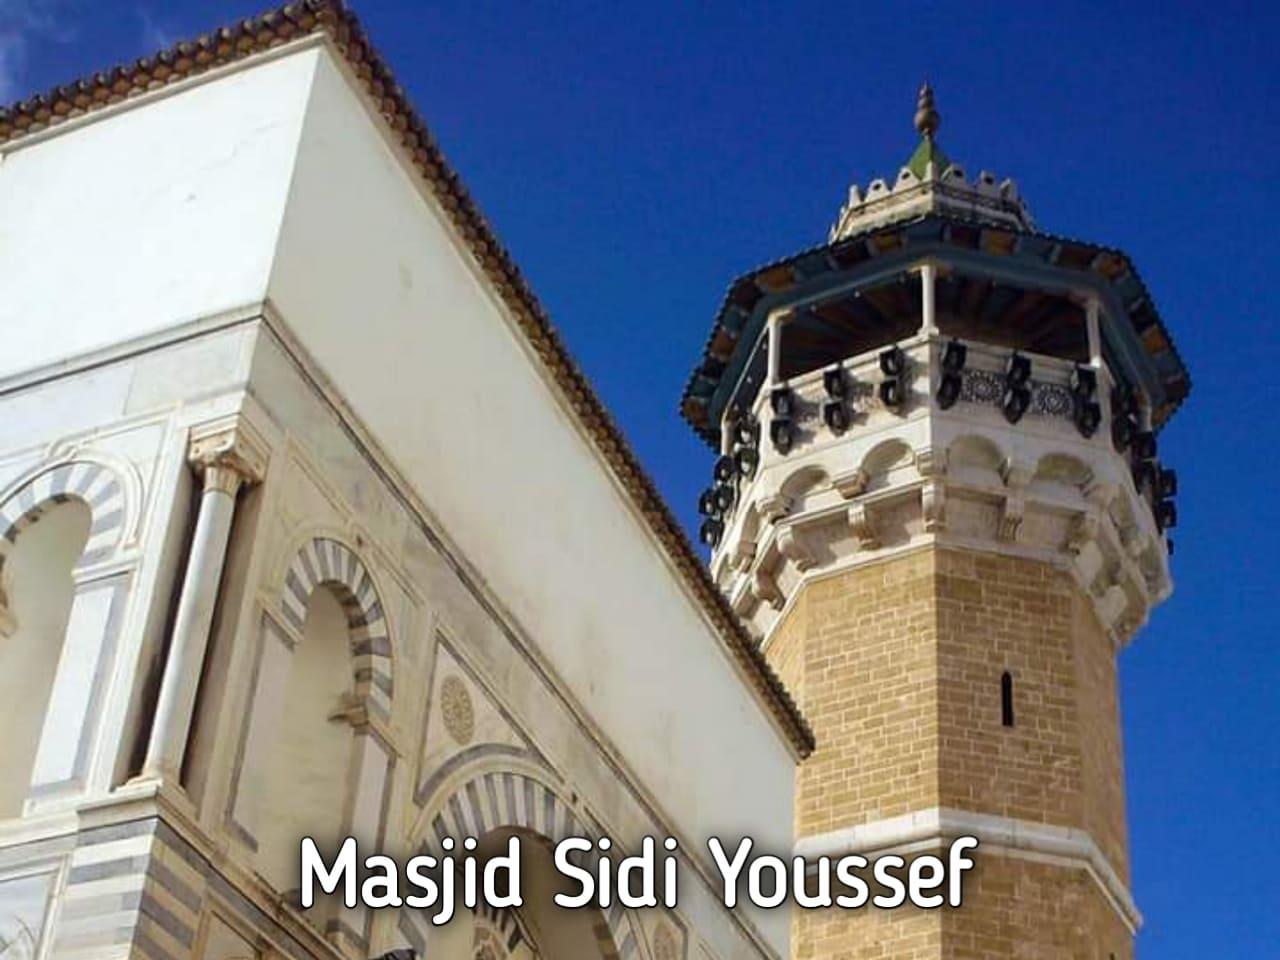 Mengintip Arsitek Masjid Sidi Youssef, Masjid Hanafi Pertama di Tunisia